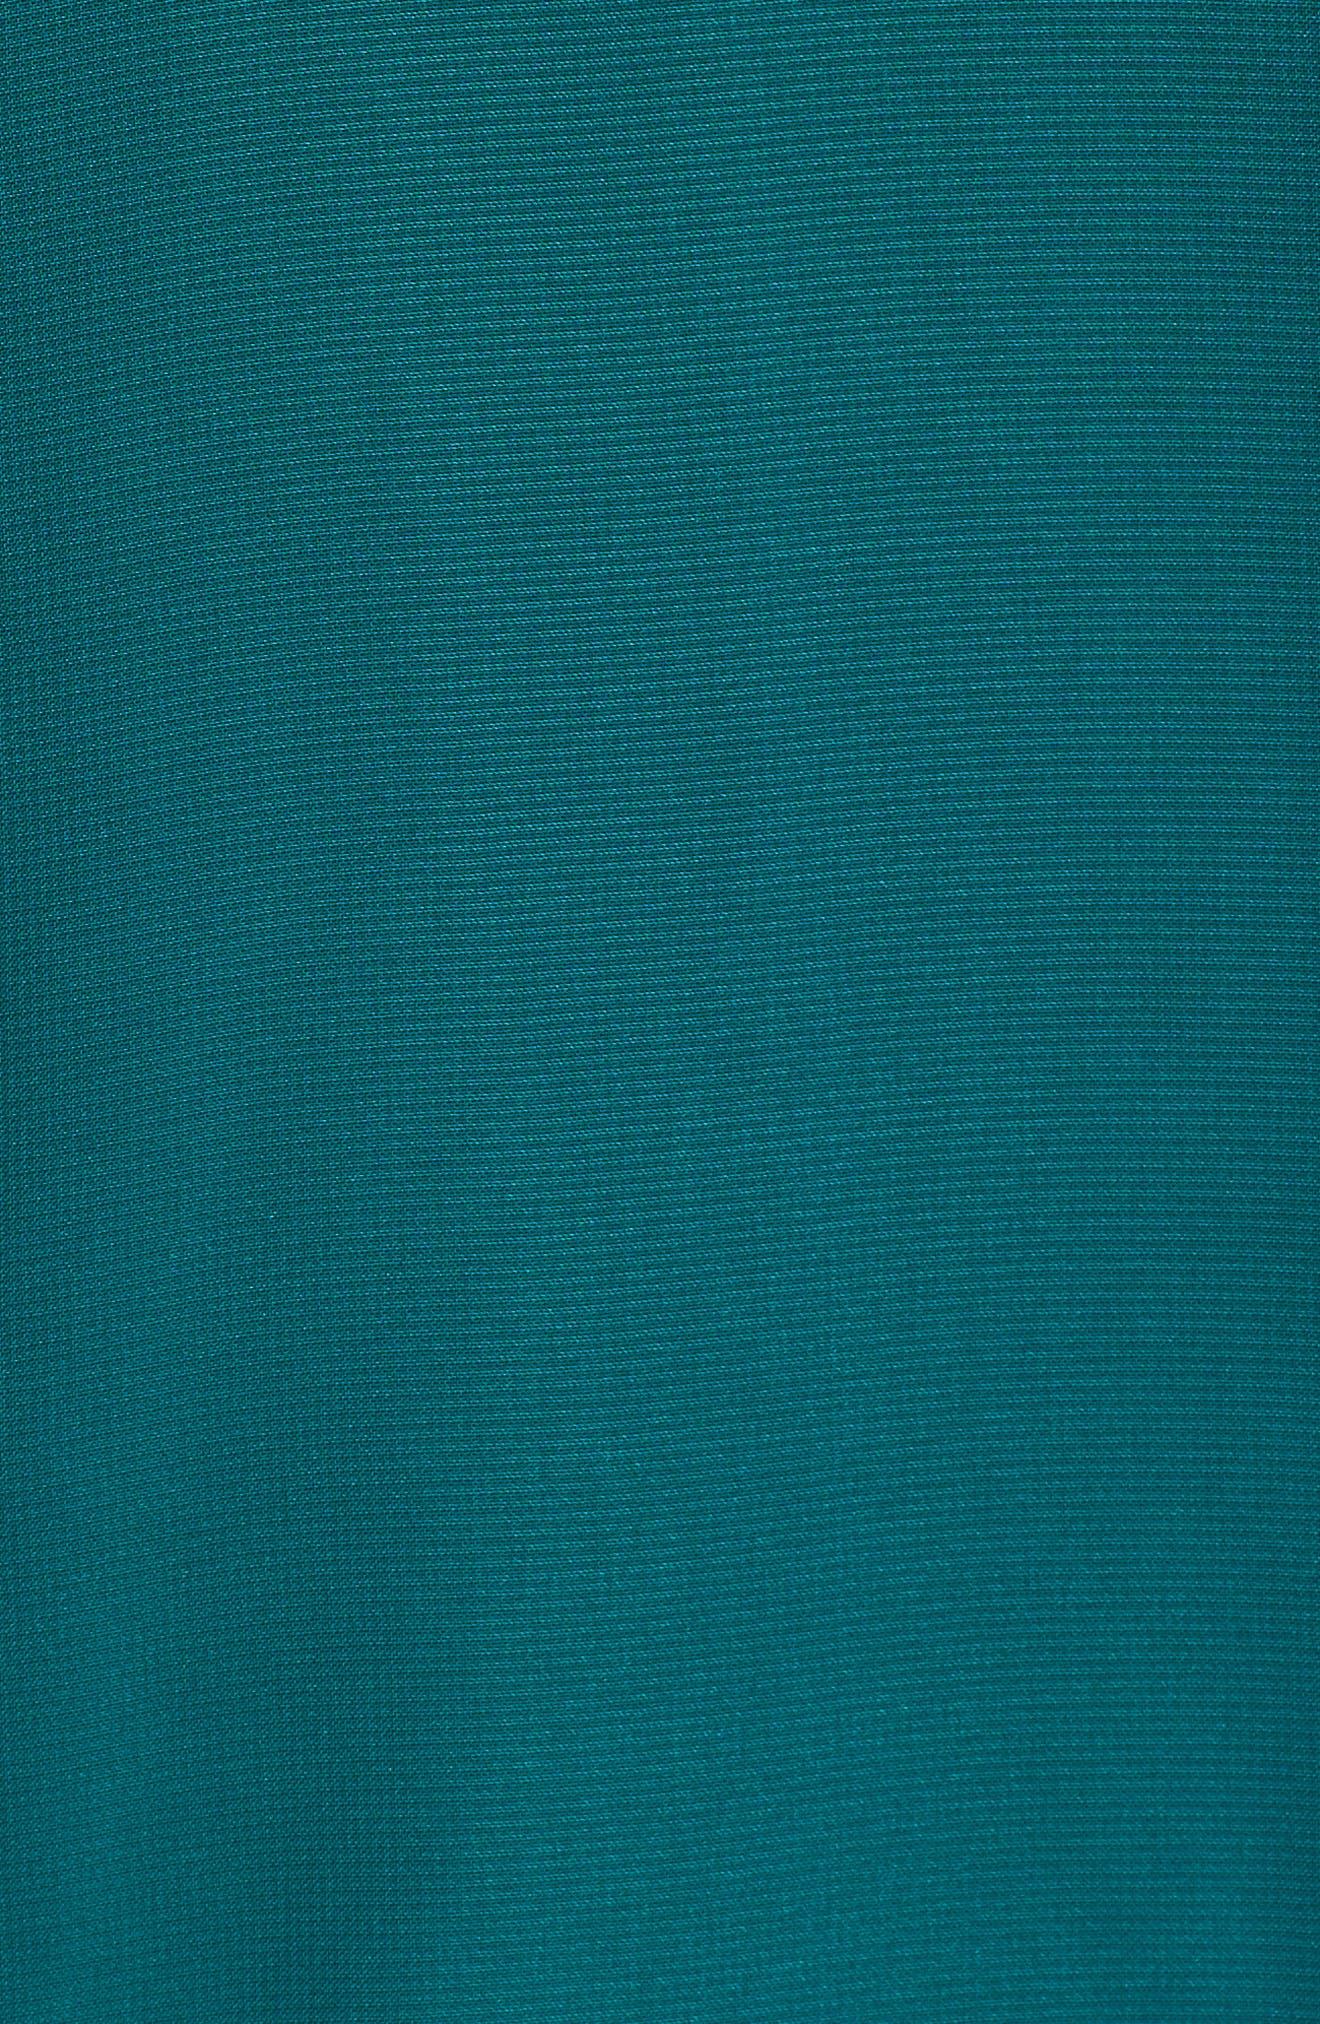 Gigi Choker Shift Dress,                             Alternate thumbnail 5, color,                             440